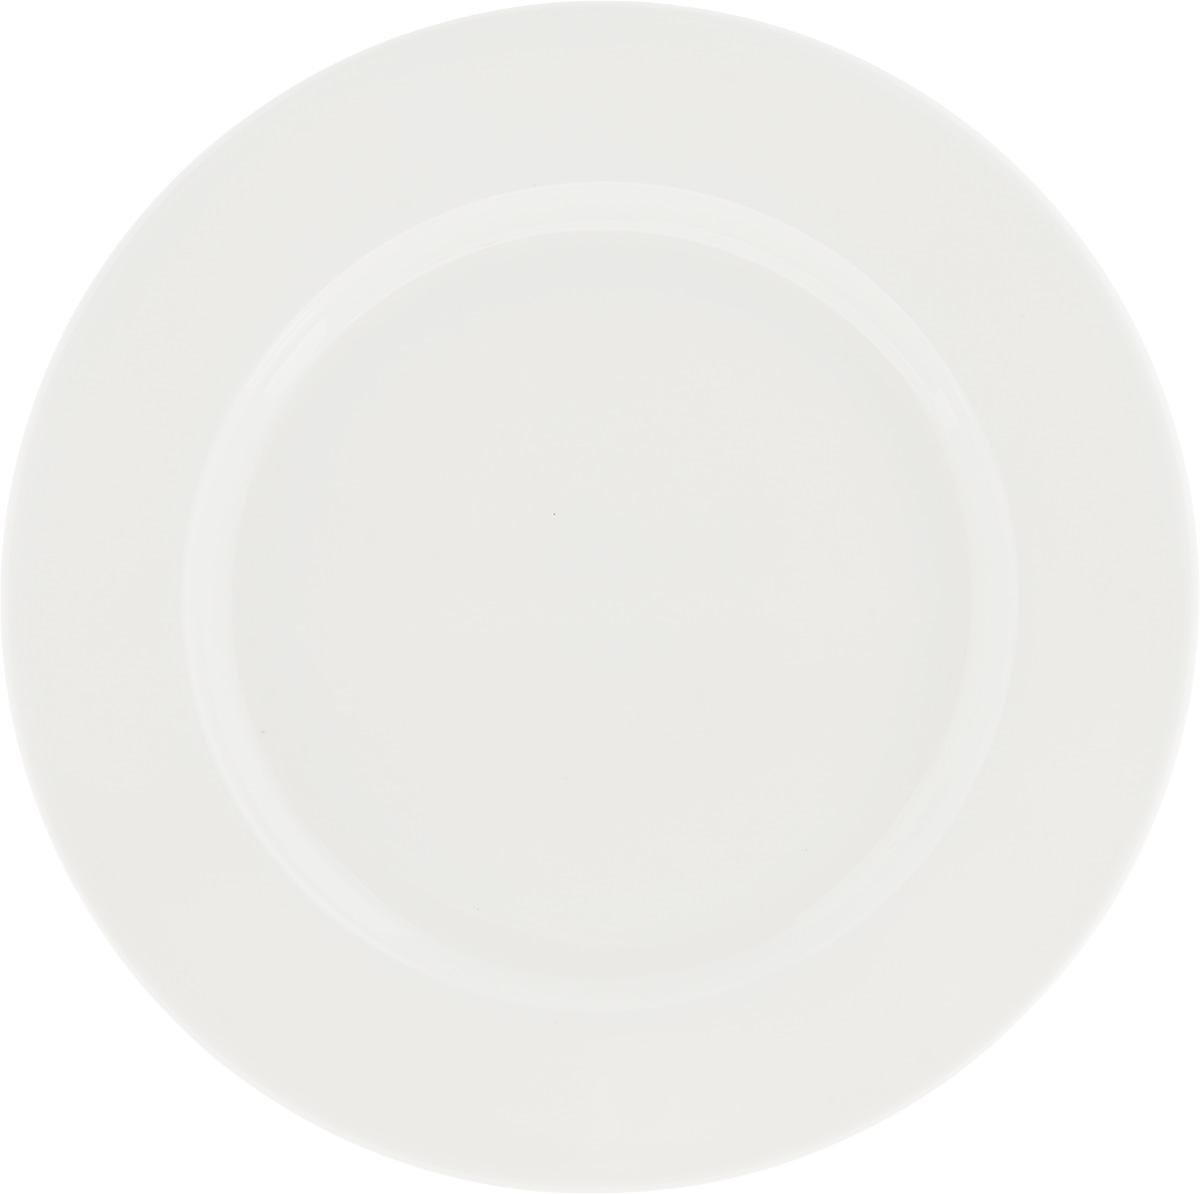 Тарелка Ariane Прайм, диаметр 19 см